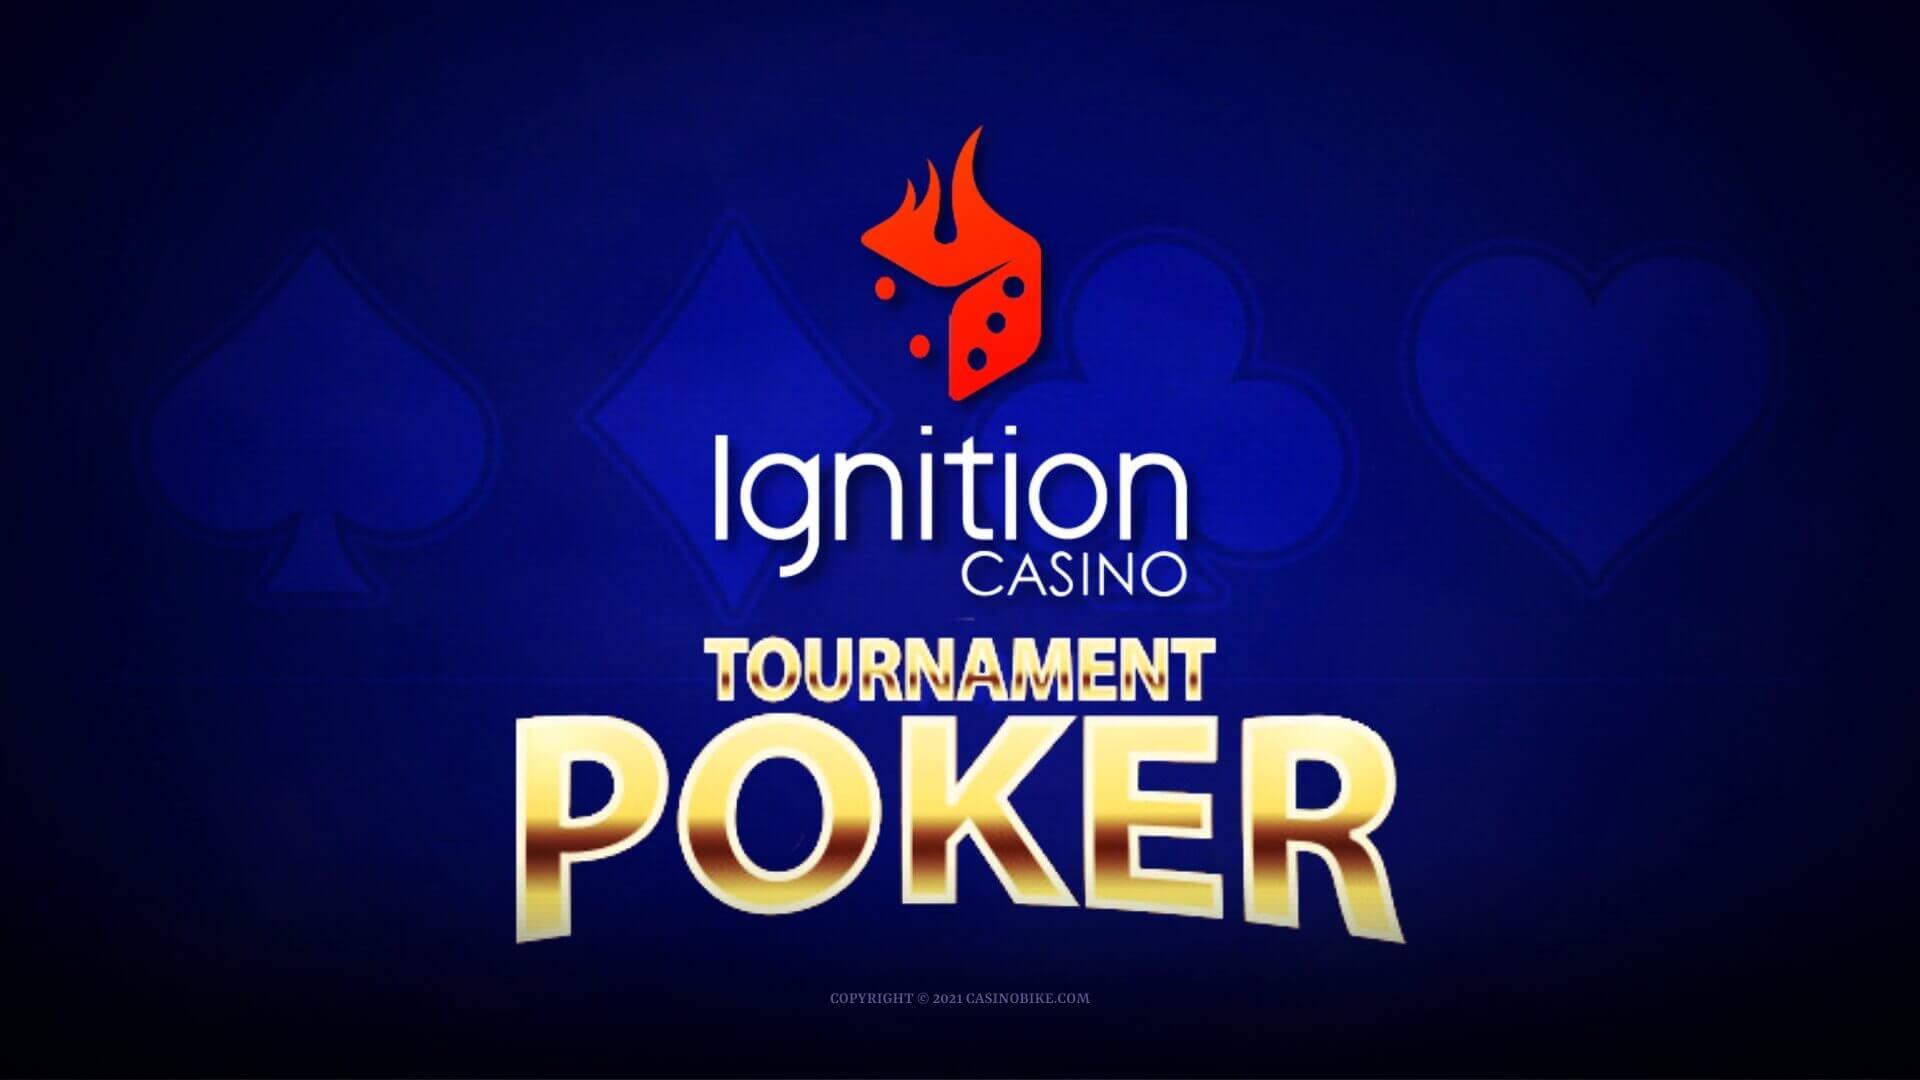 Ignition Casino Poker Tournament